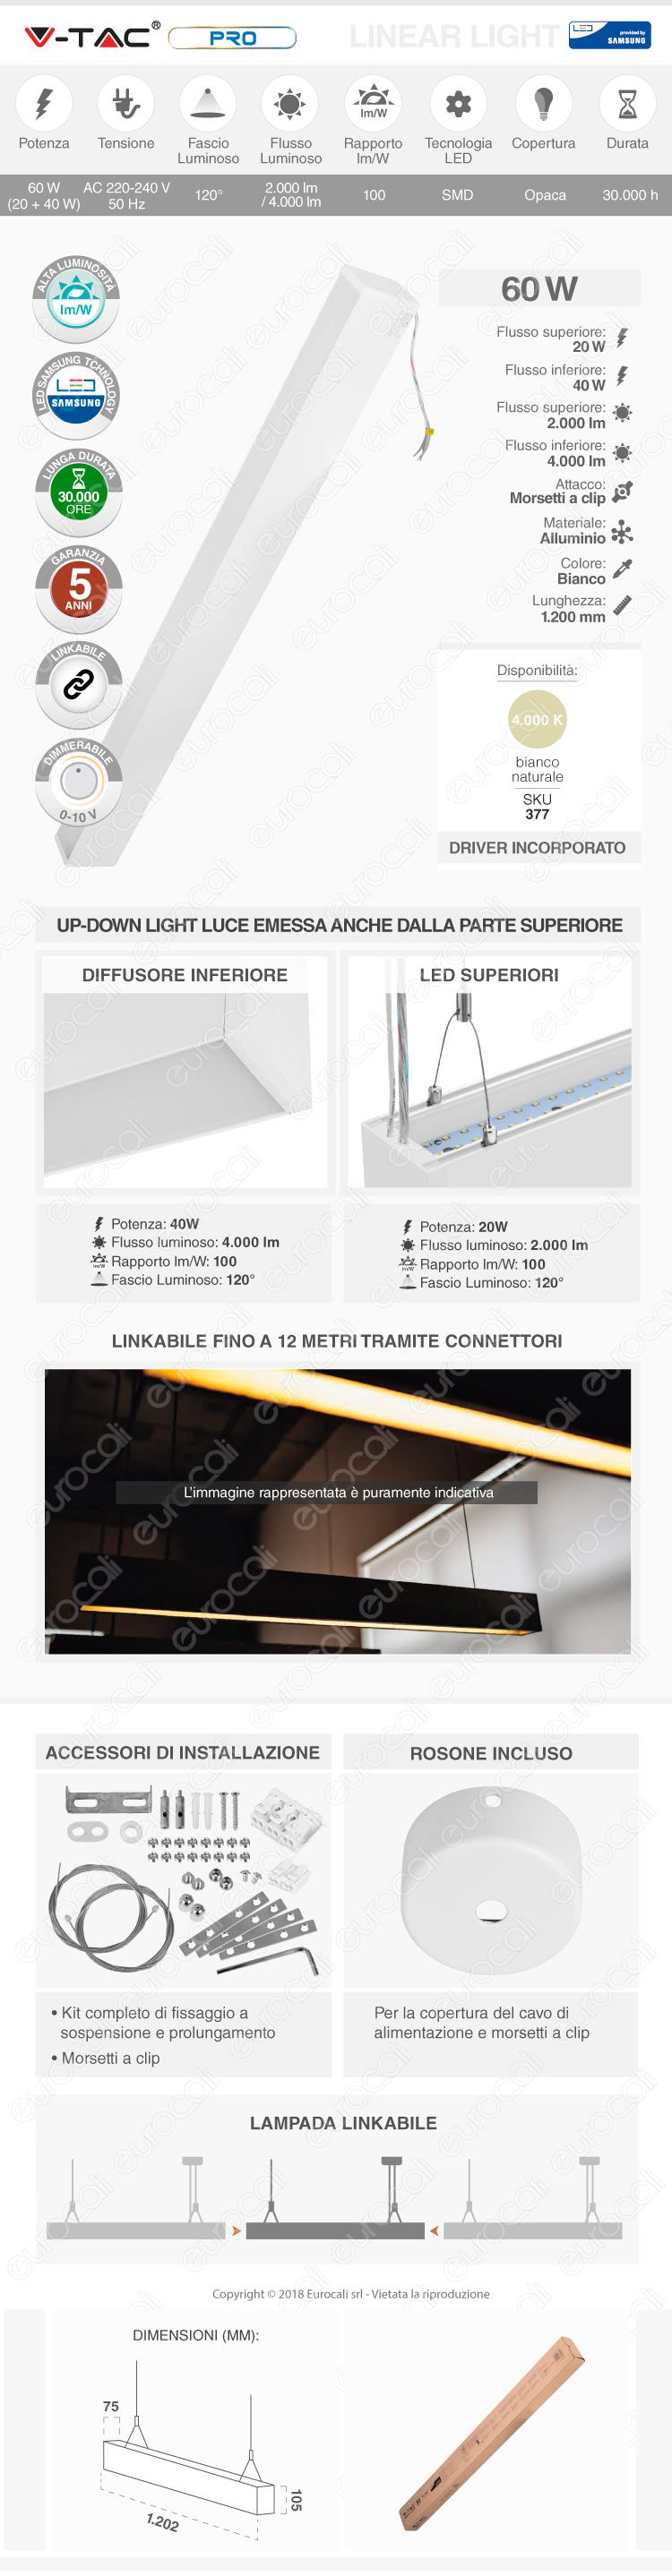 V-Tac PRO VT-7-60 Lampada LED a Sospensione Linear Light 60W Chip Samsung White Body Dimmerabile